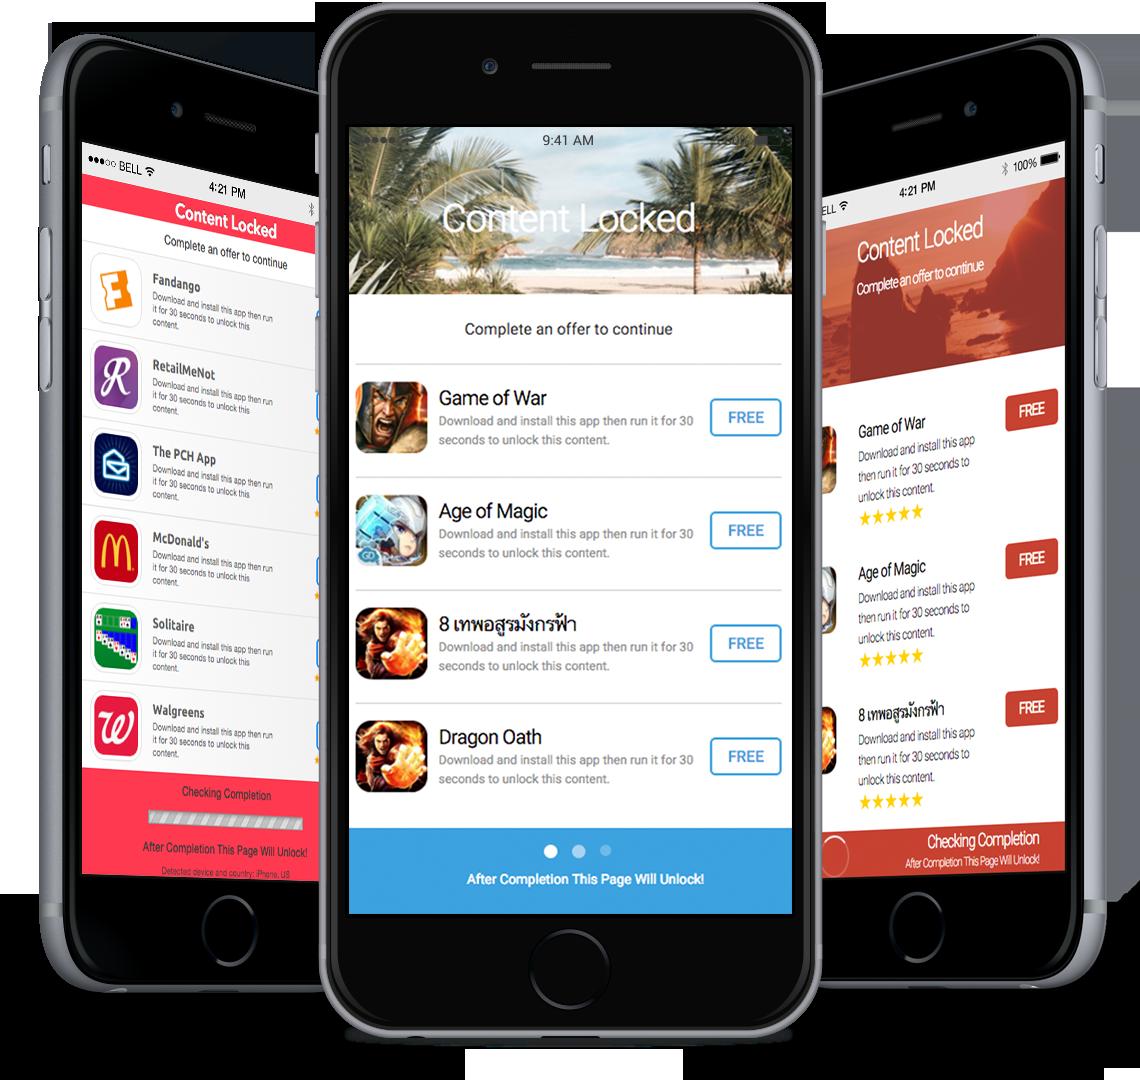 OGAds com   Mobile & Desktop Incentive Affiliate Content Locking Network